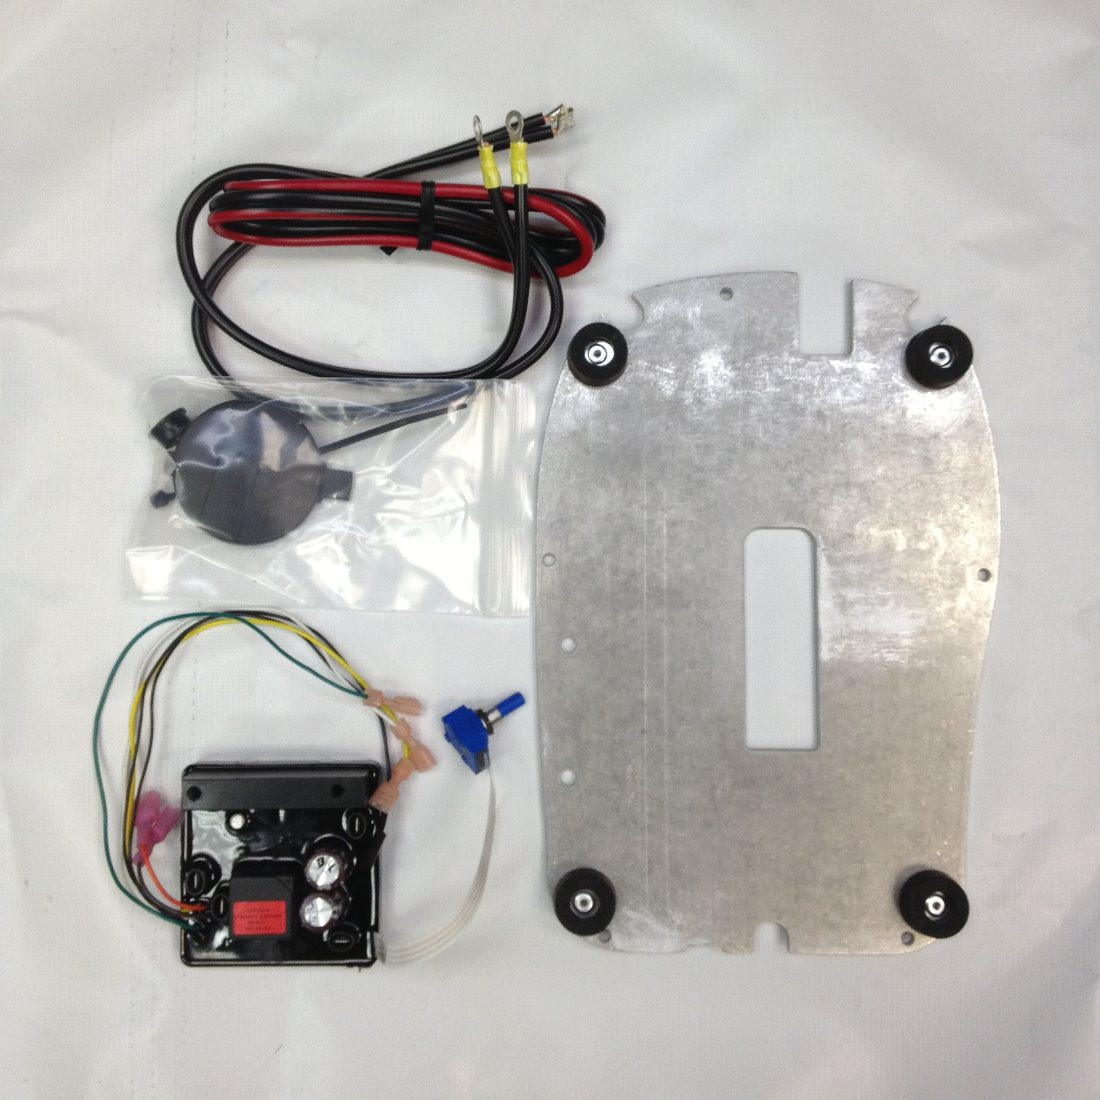 small resolution of minn kota maxxum 12 volt control board upgrade price 179 95 image 1 larger more photos